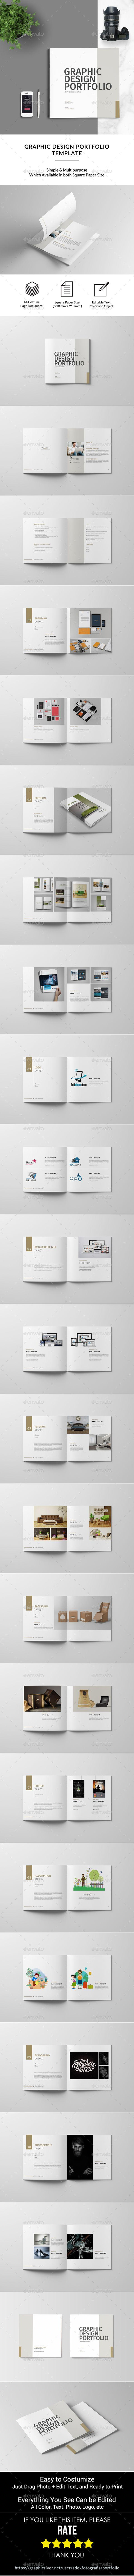 Graphic Design Portfolio Template — InDesign INDD #simple #minimalist • Download ➝ https://graphicriver.net/item/graphic-design-portfolio-template/19899858?ref=pxcr